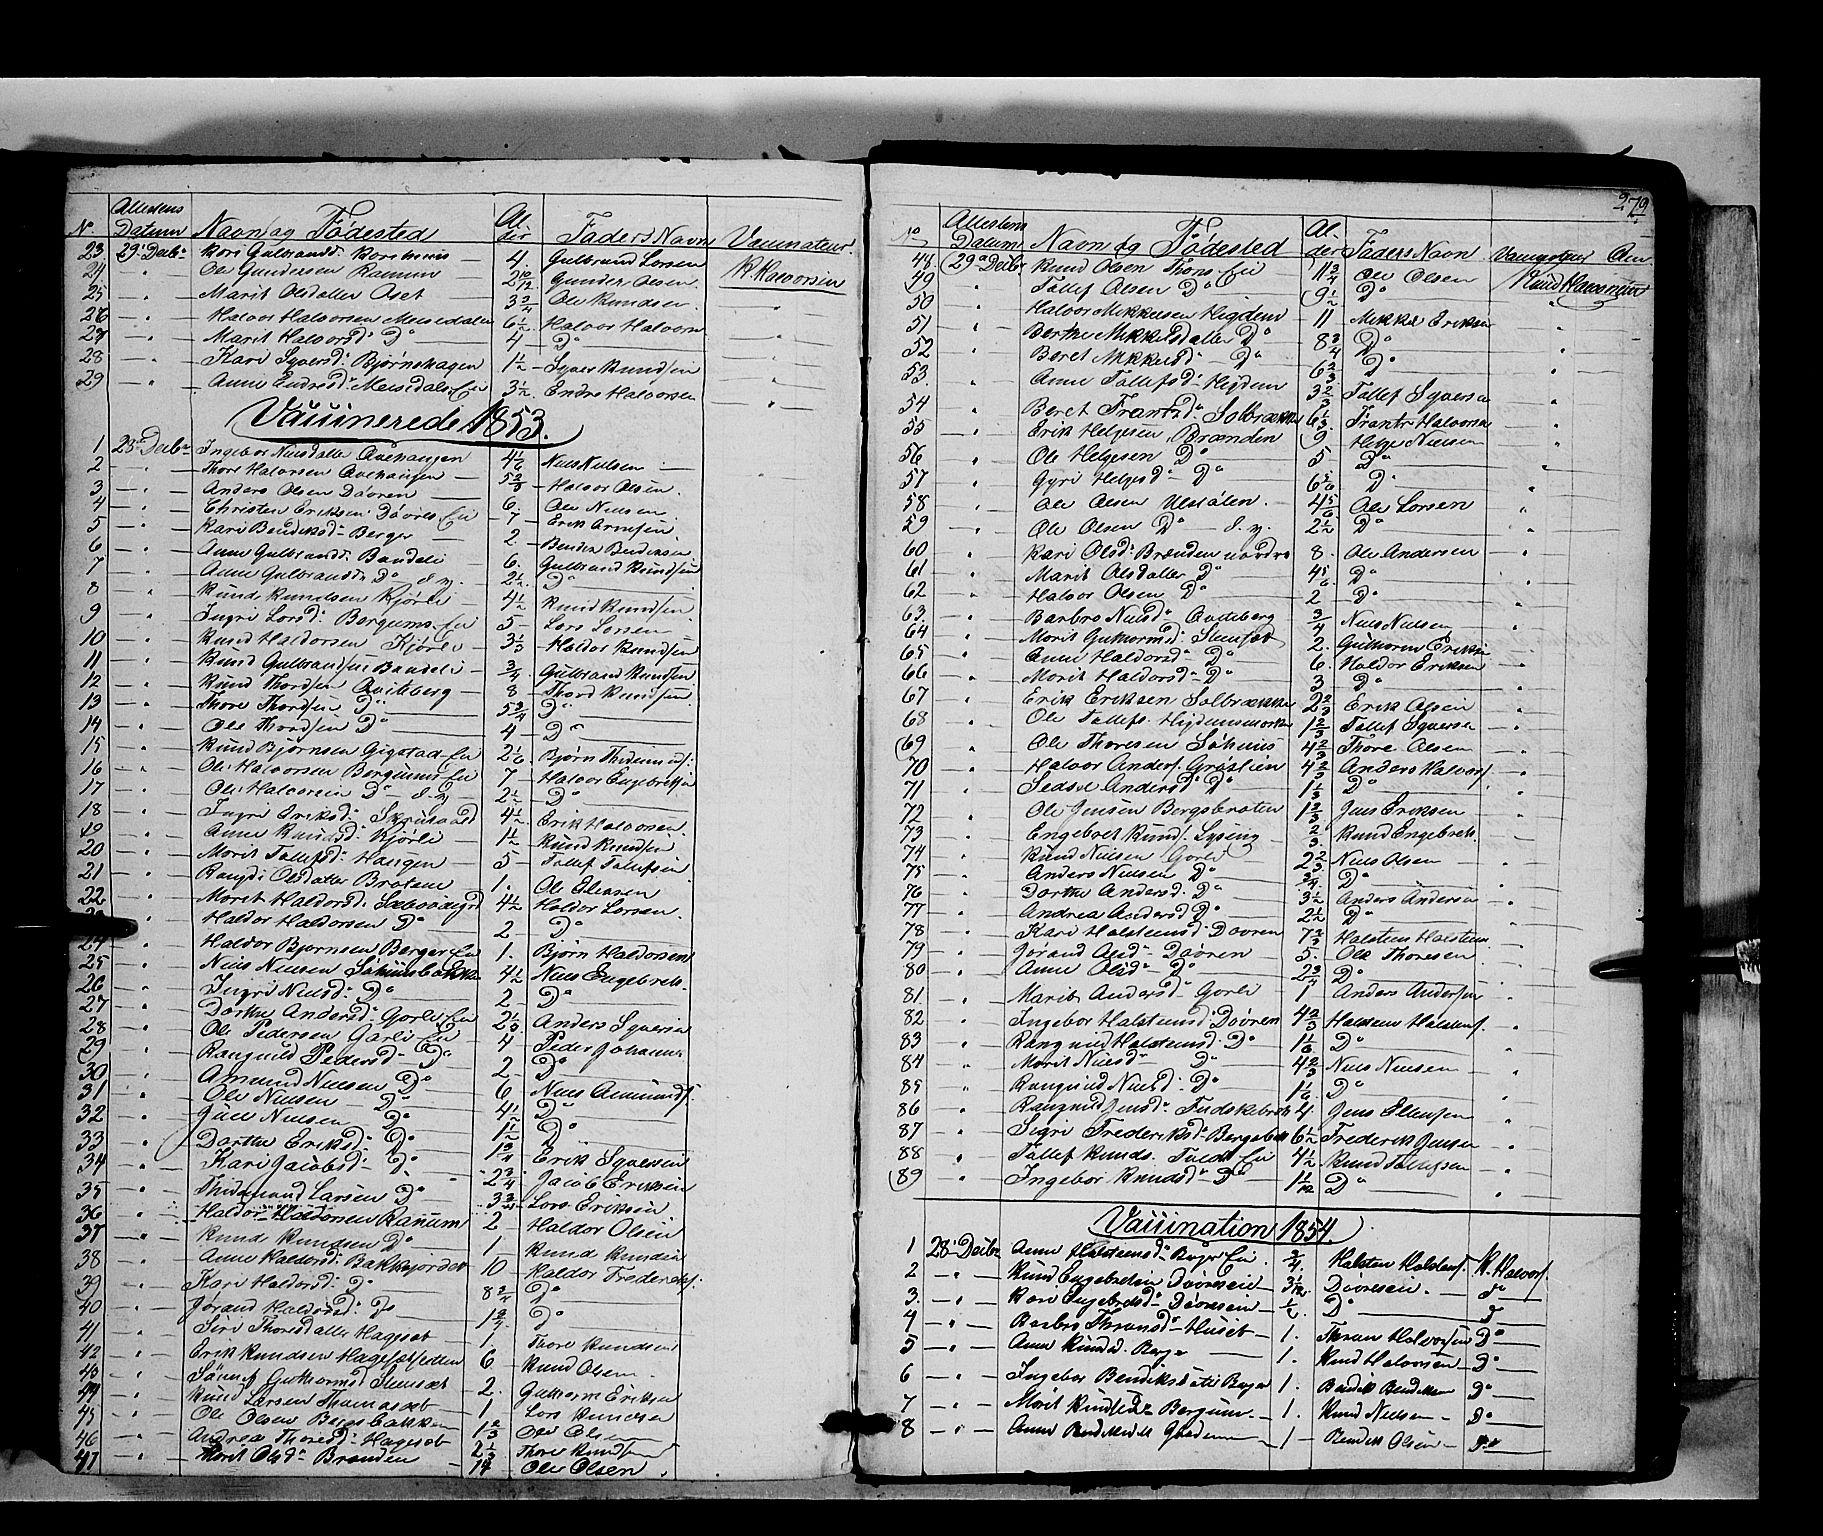 SAH, Nord-Aurdal prestekontor, Ministerialbok nr. 7, 1842-1863, s. 279